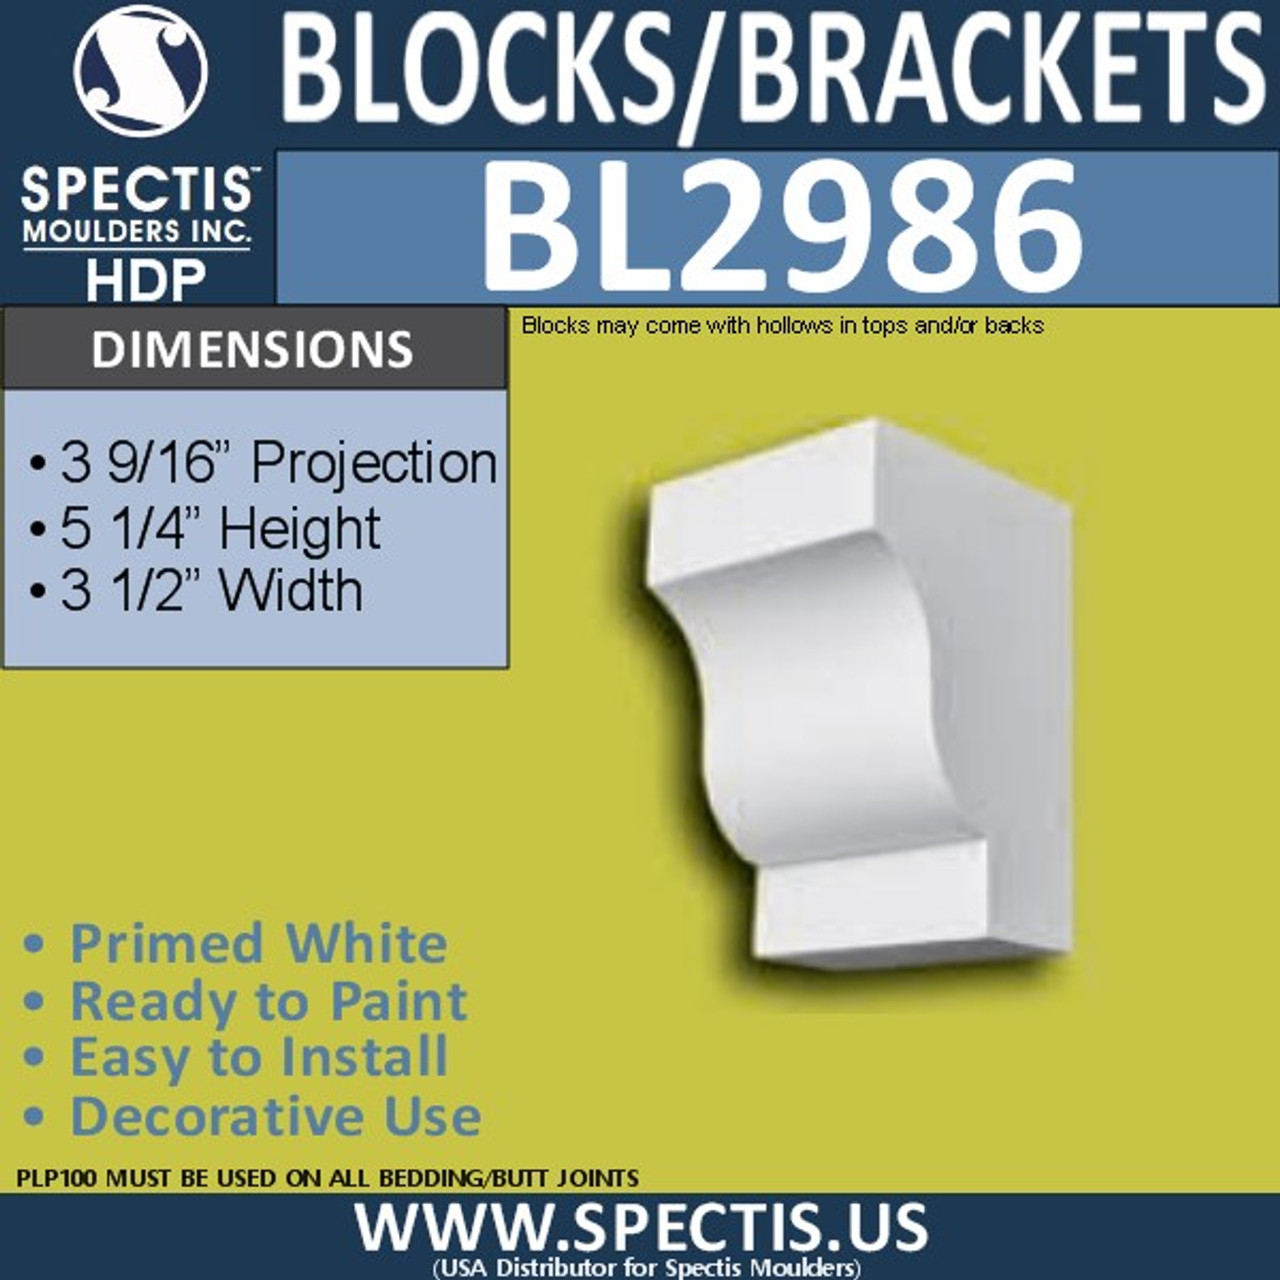 "BL2986 Eave Block or Bracket 3.5""W x 5.25""H x 3.56"" P"